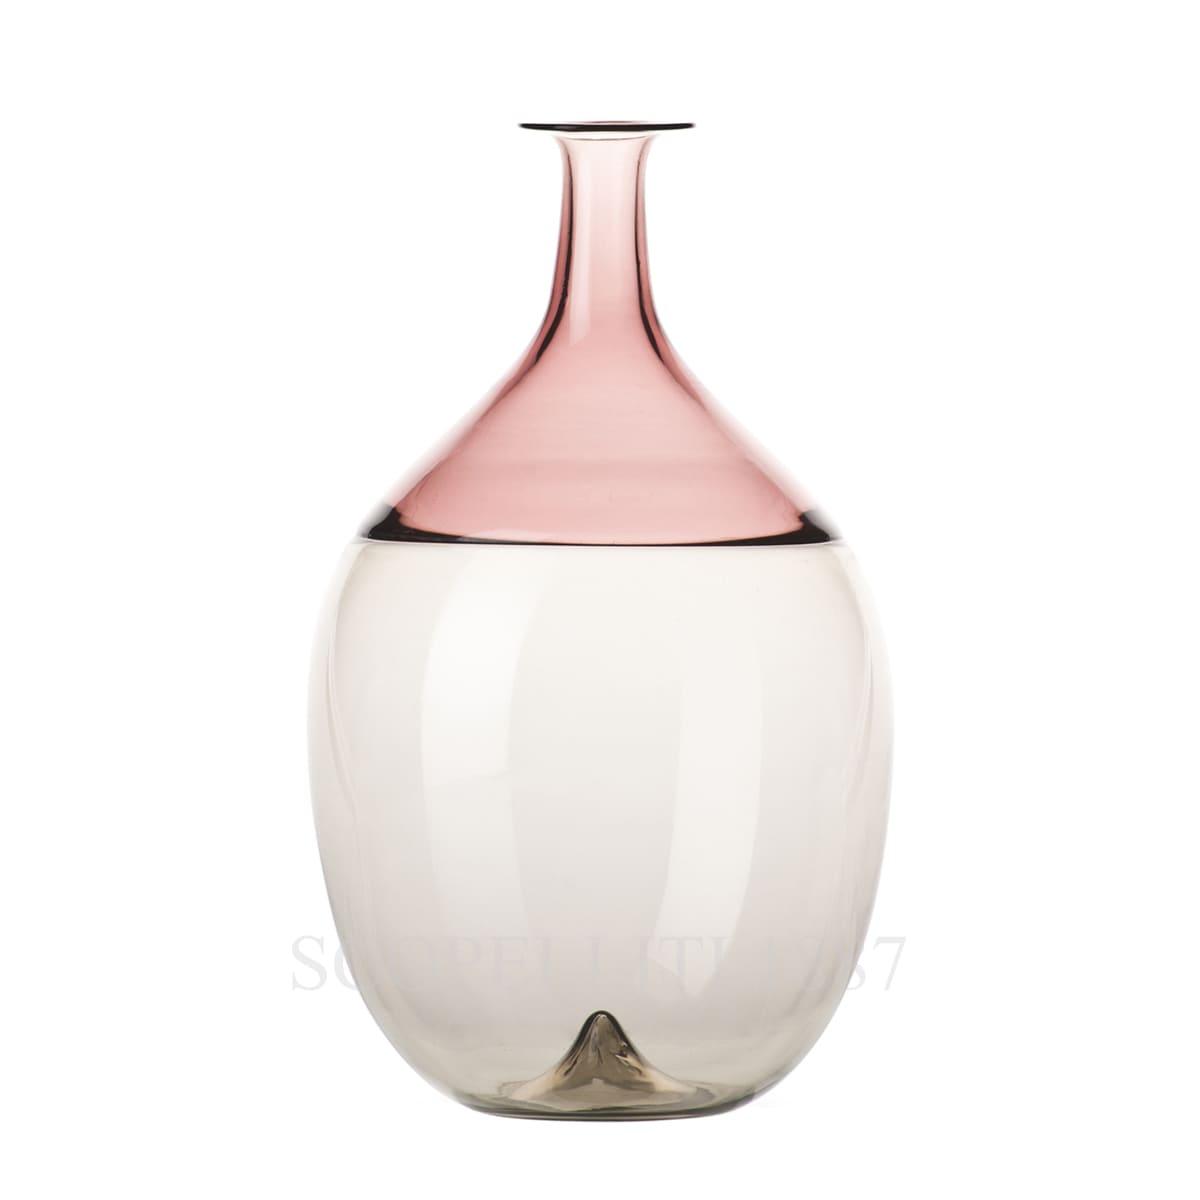 Venini Bolle grey/violet 502.02 Bottle